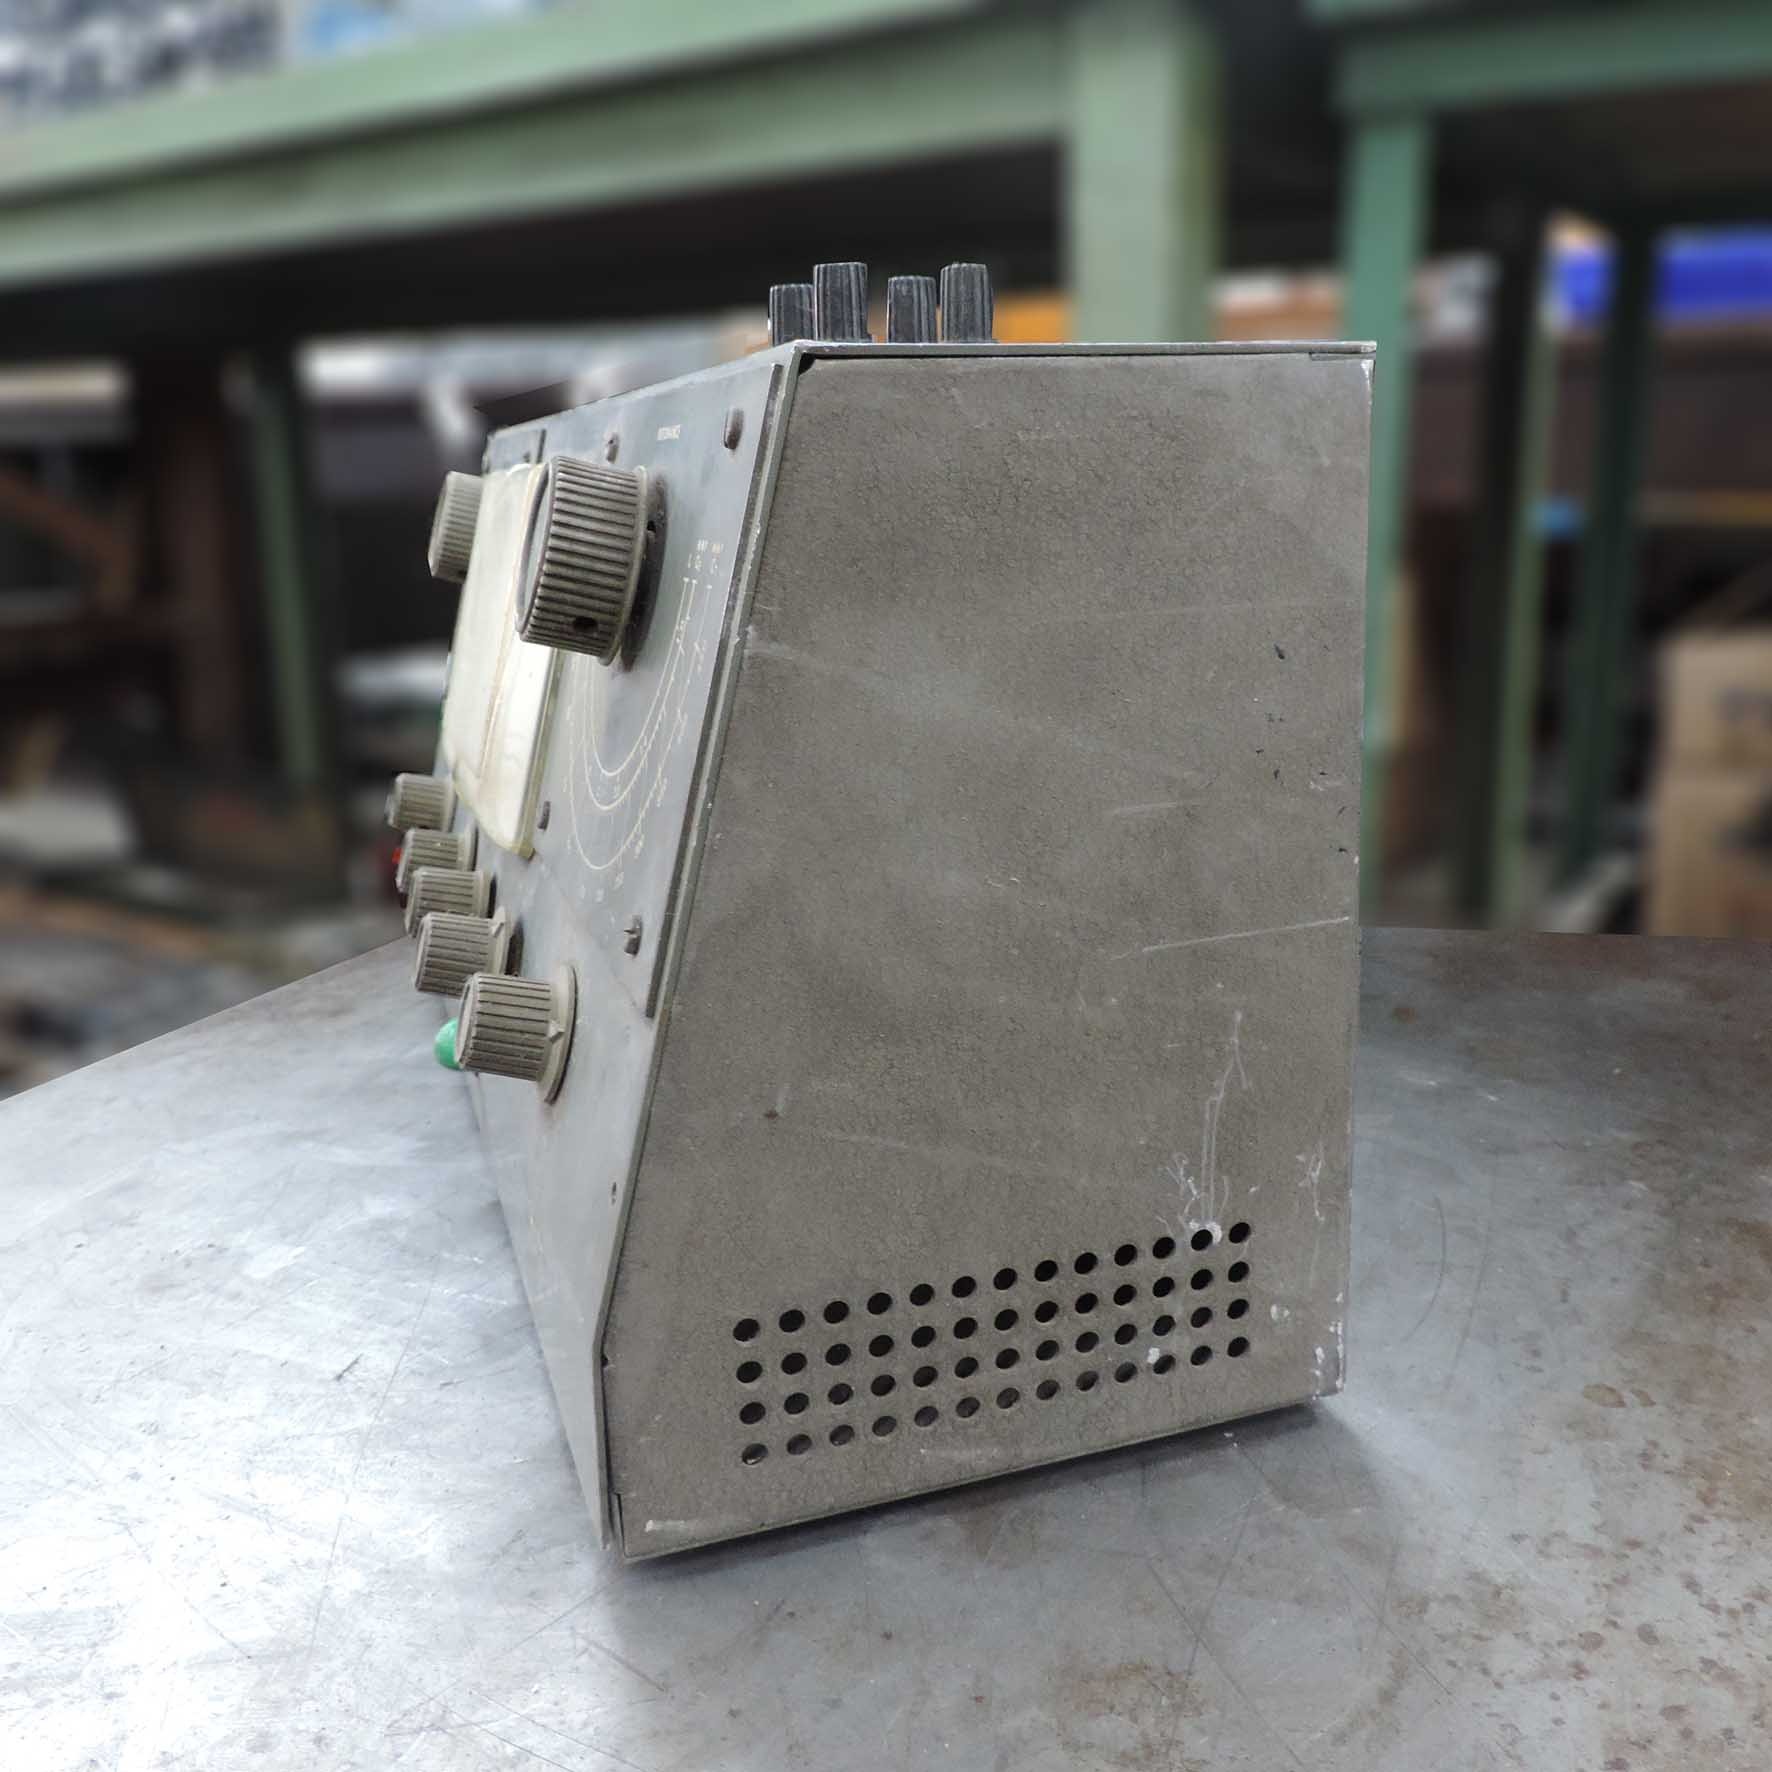 Medidor De Radiofrequência Heathkit SM168 - Usado